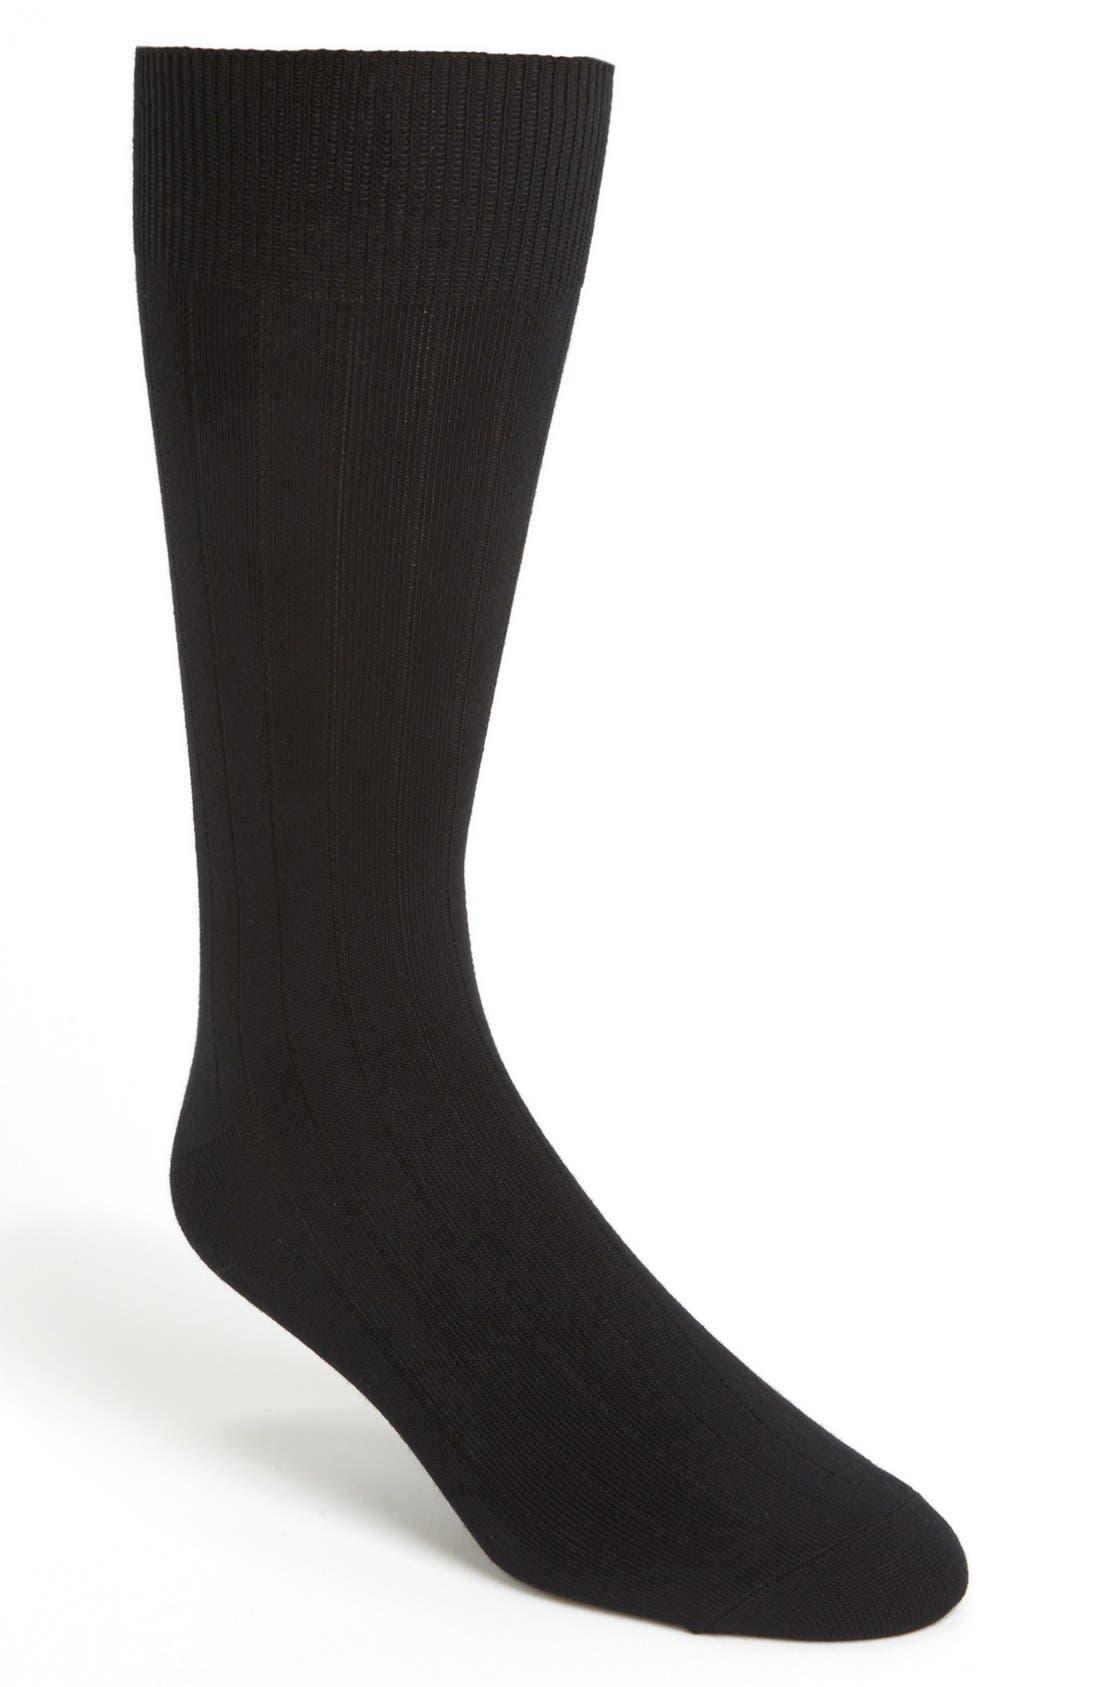 Alternate Image 1 Selected - Cole Haan Pima Cotton Blend Socks (3-Pack)